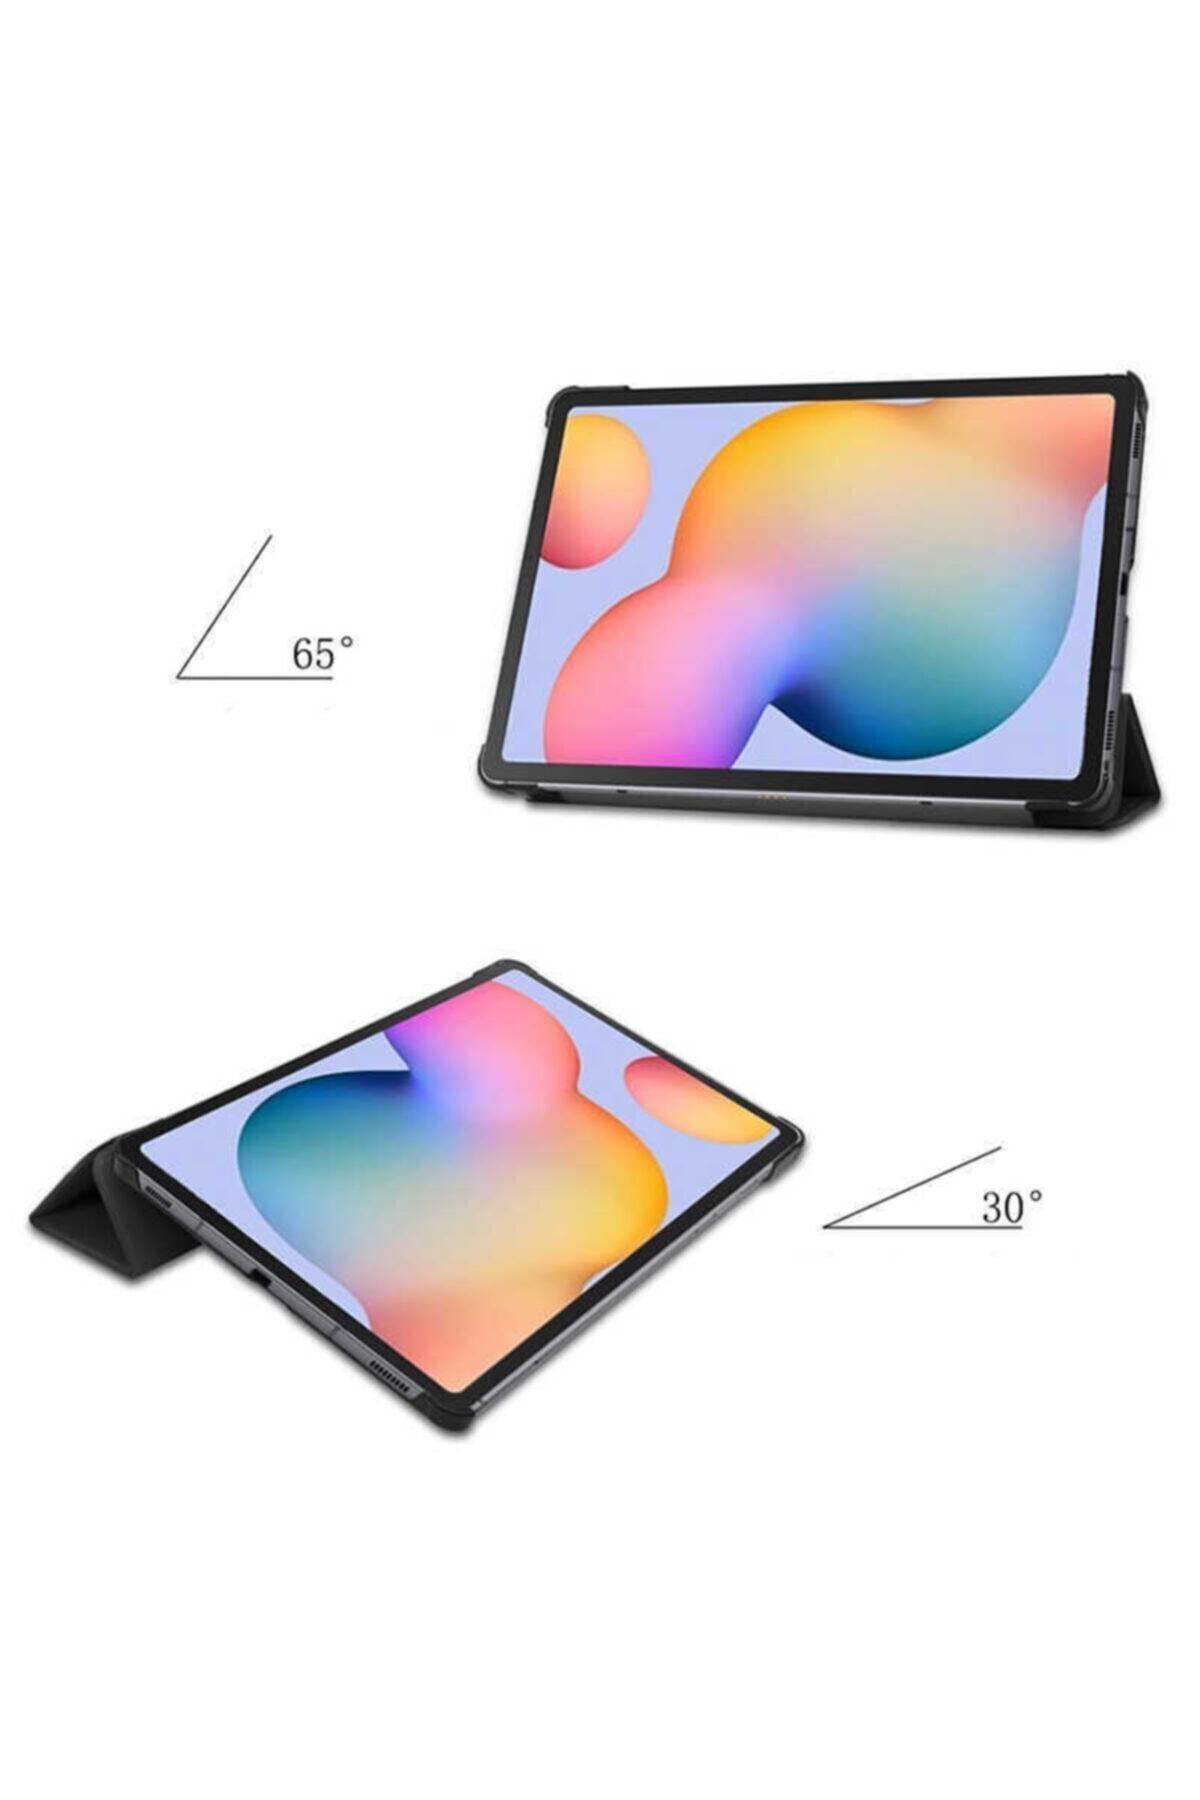 Zore Samsung Galaxy Tab A7 10.4 (2020) Sm-t500 Uyku Modlu Mıknatıslı Kapak Smart Kılıf